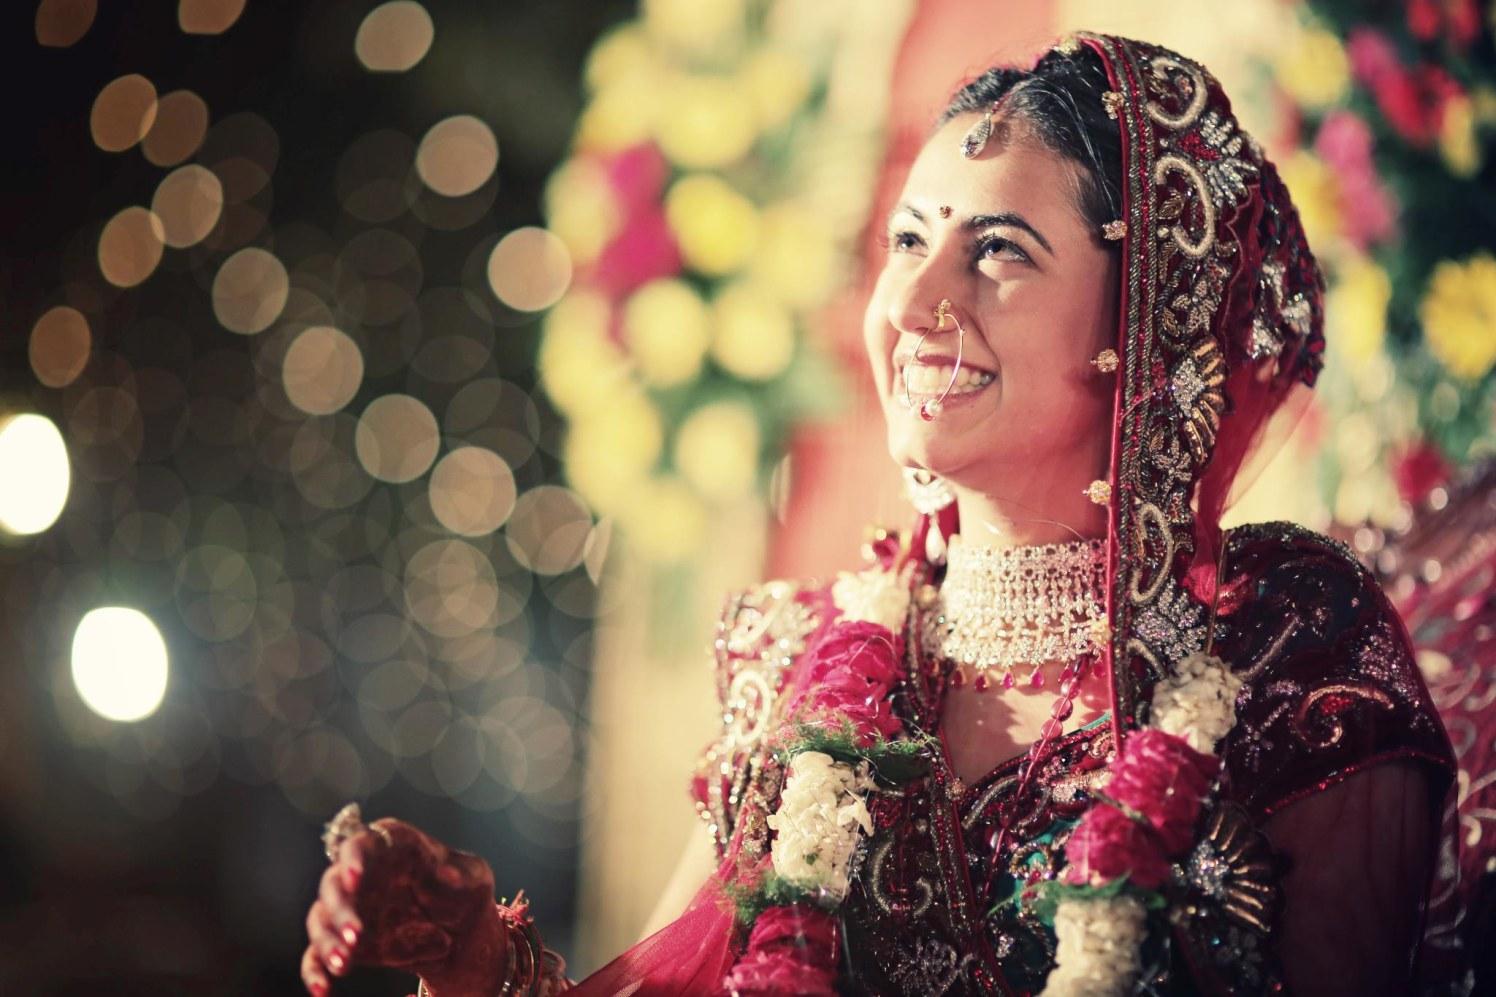 Glowy from the inside by Wedding Krafter Wedding-photography | Weddings Photos & Ideas